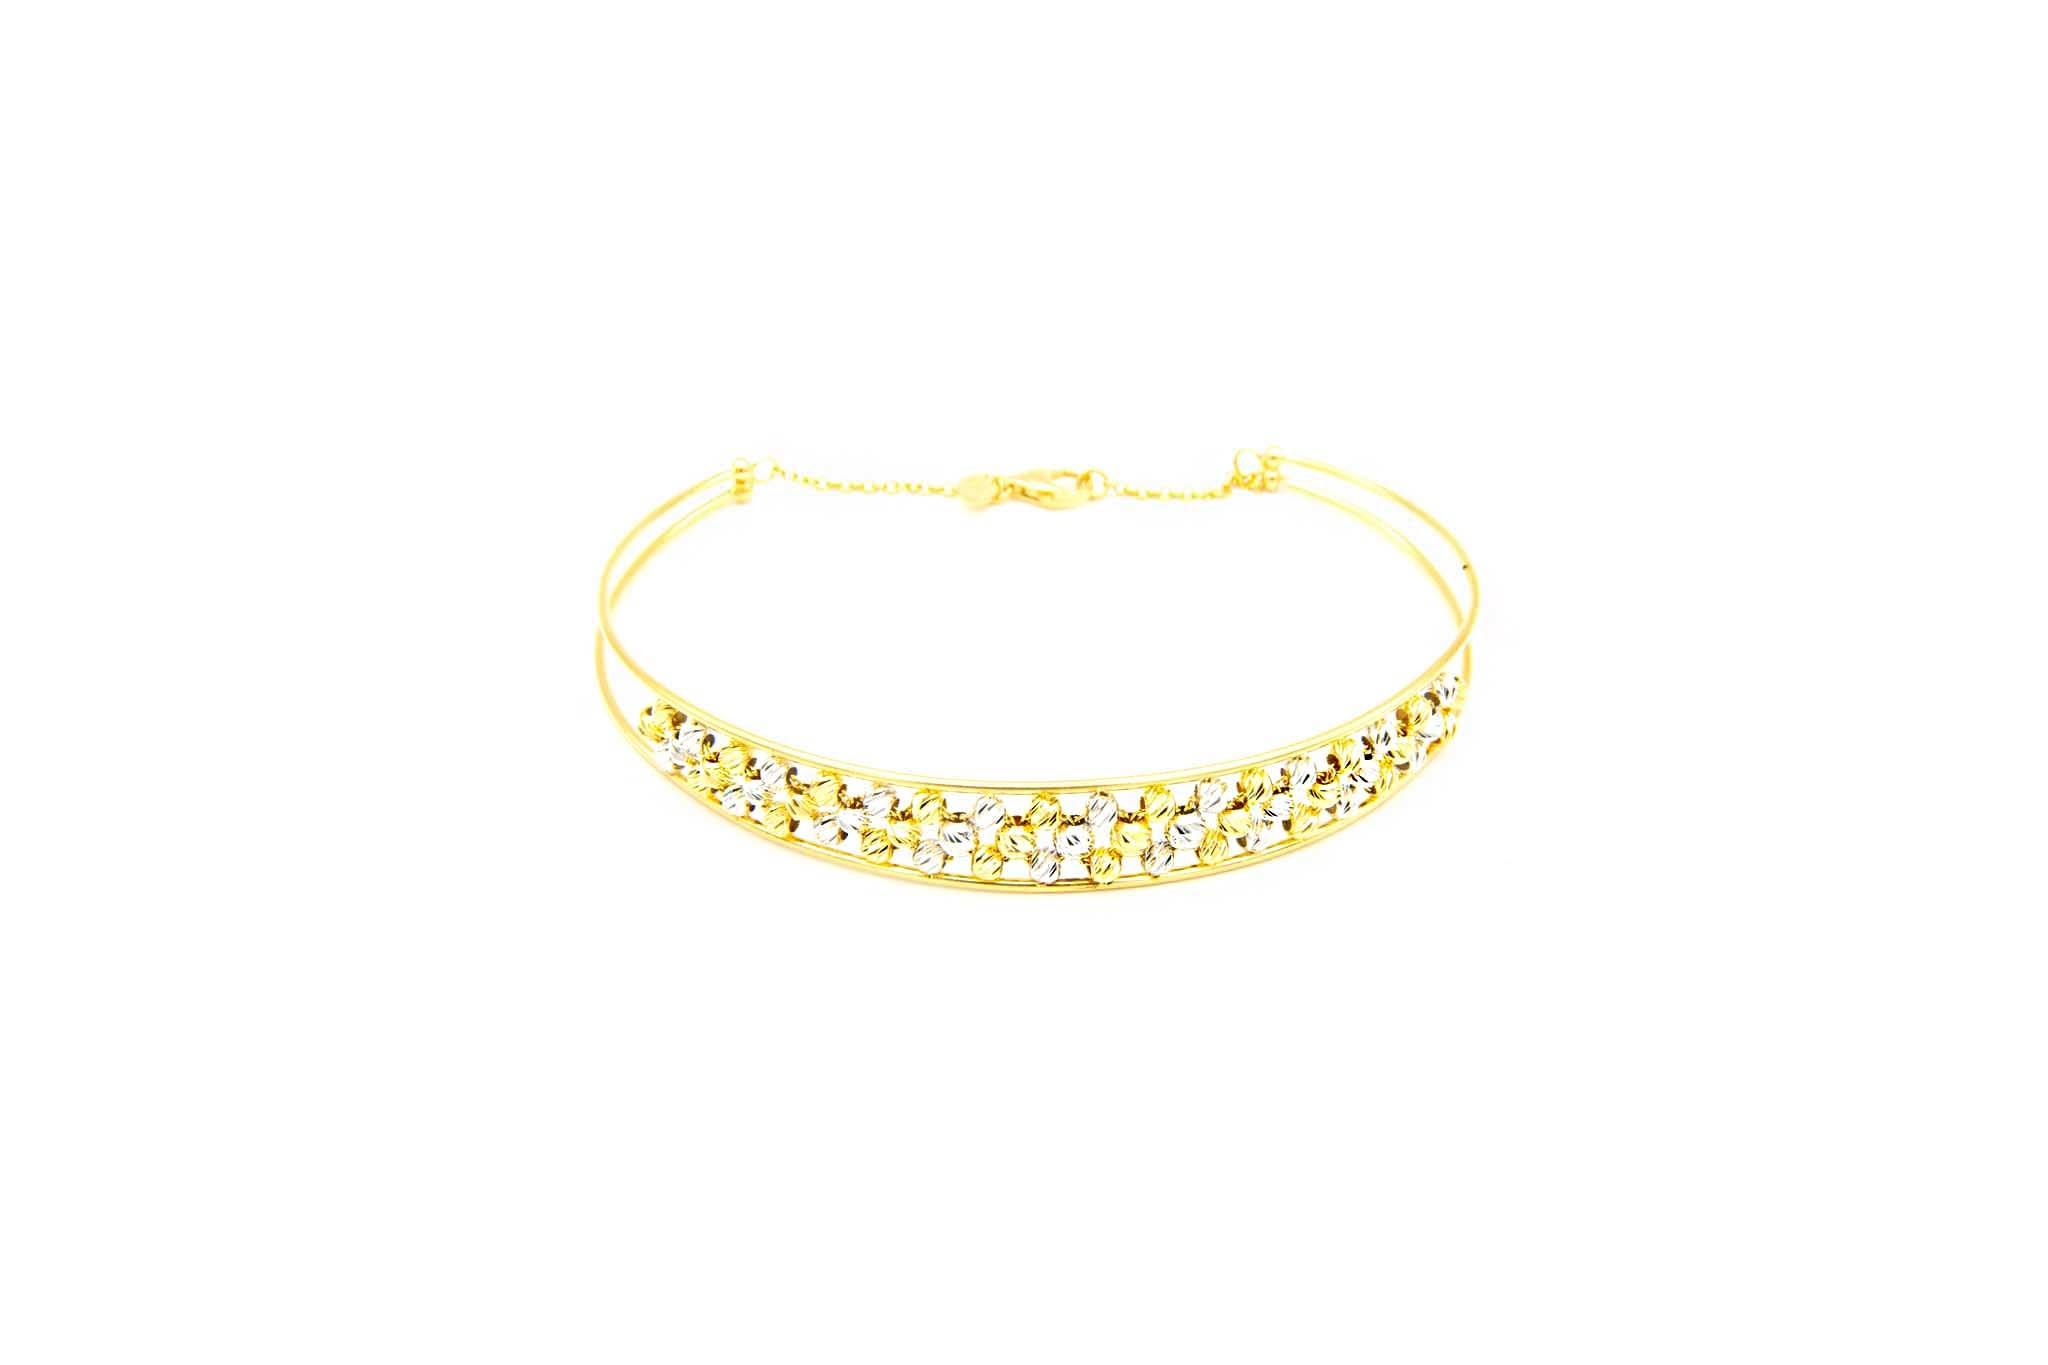 Armband opengewerkte band gevuld met diamond cut balletjes-1